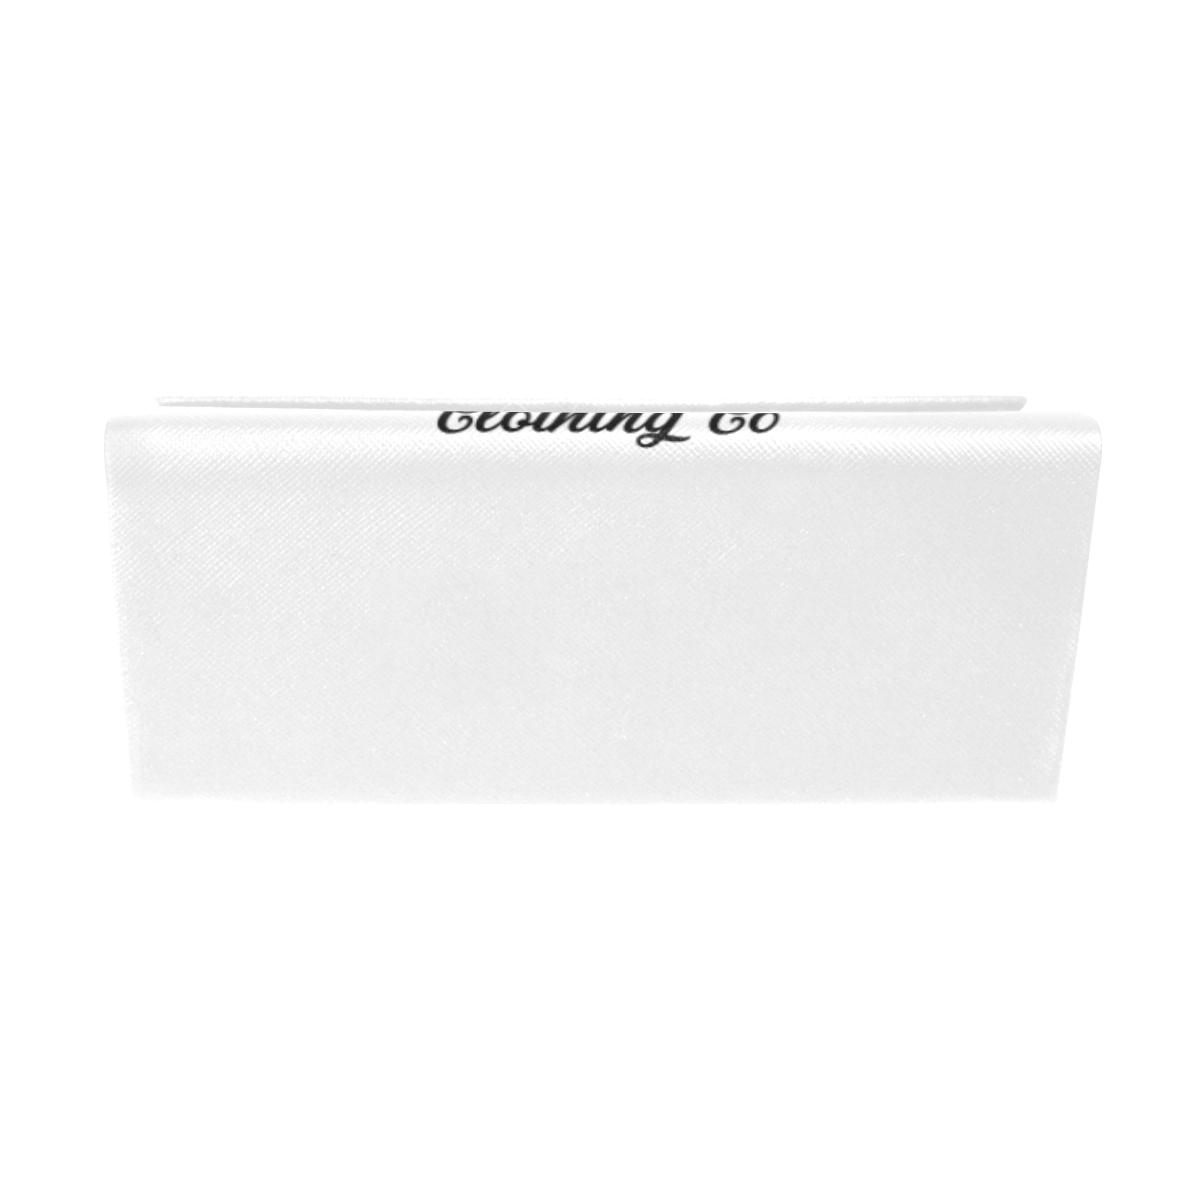 CLASSIC-WHITE GLASSES CASE Custom Foldable Glasses Case